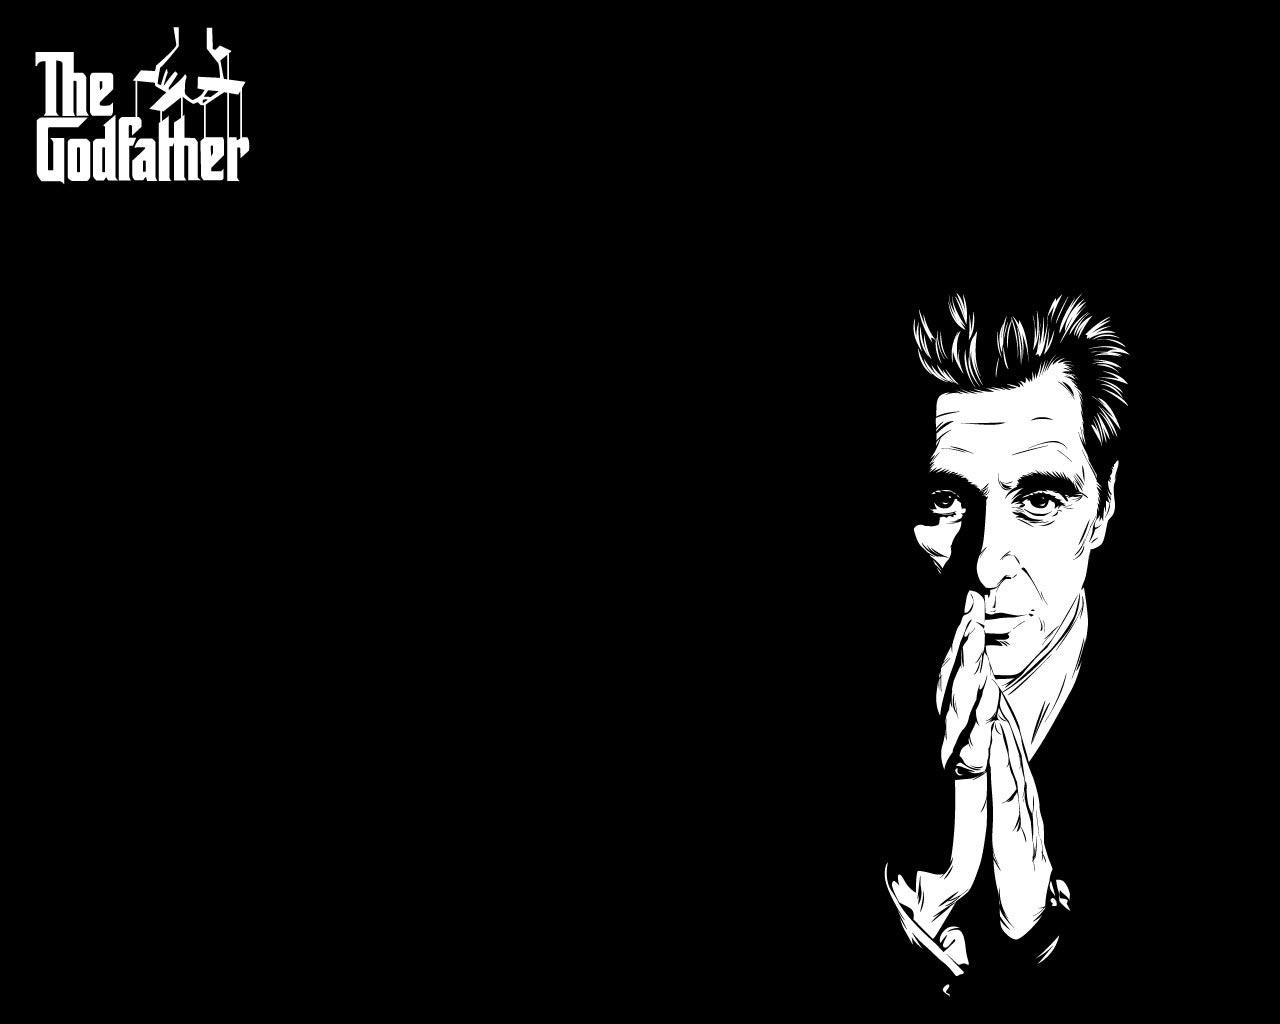 The Godfather | Sakashy's Blog